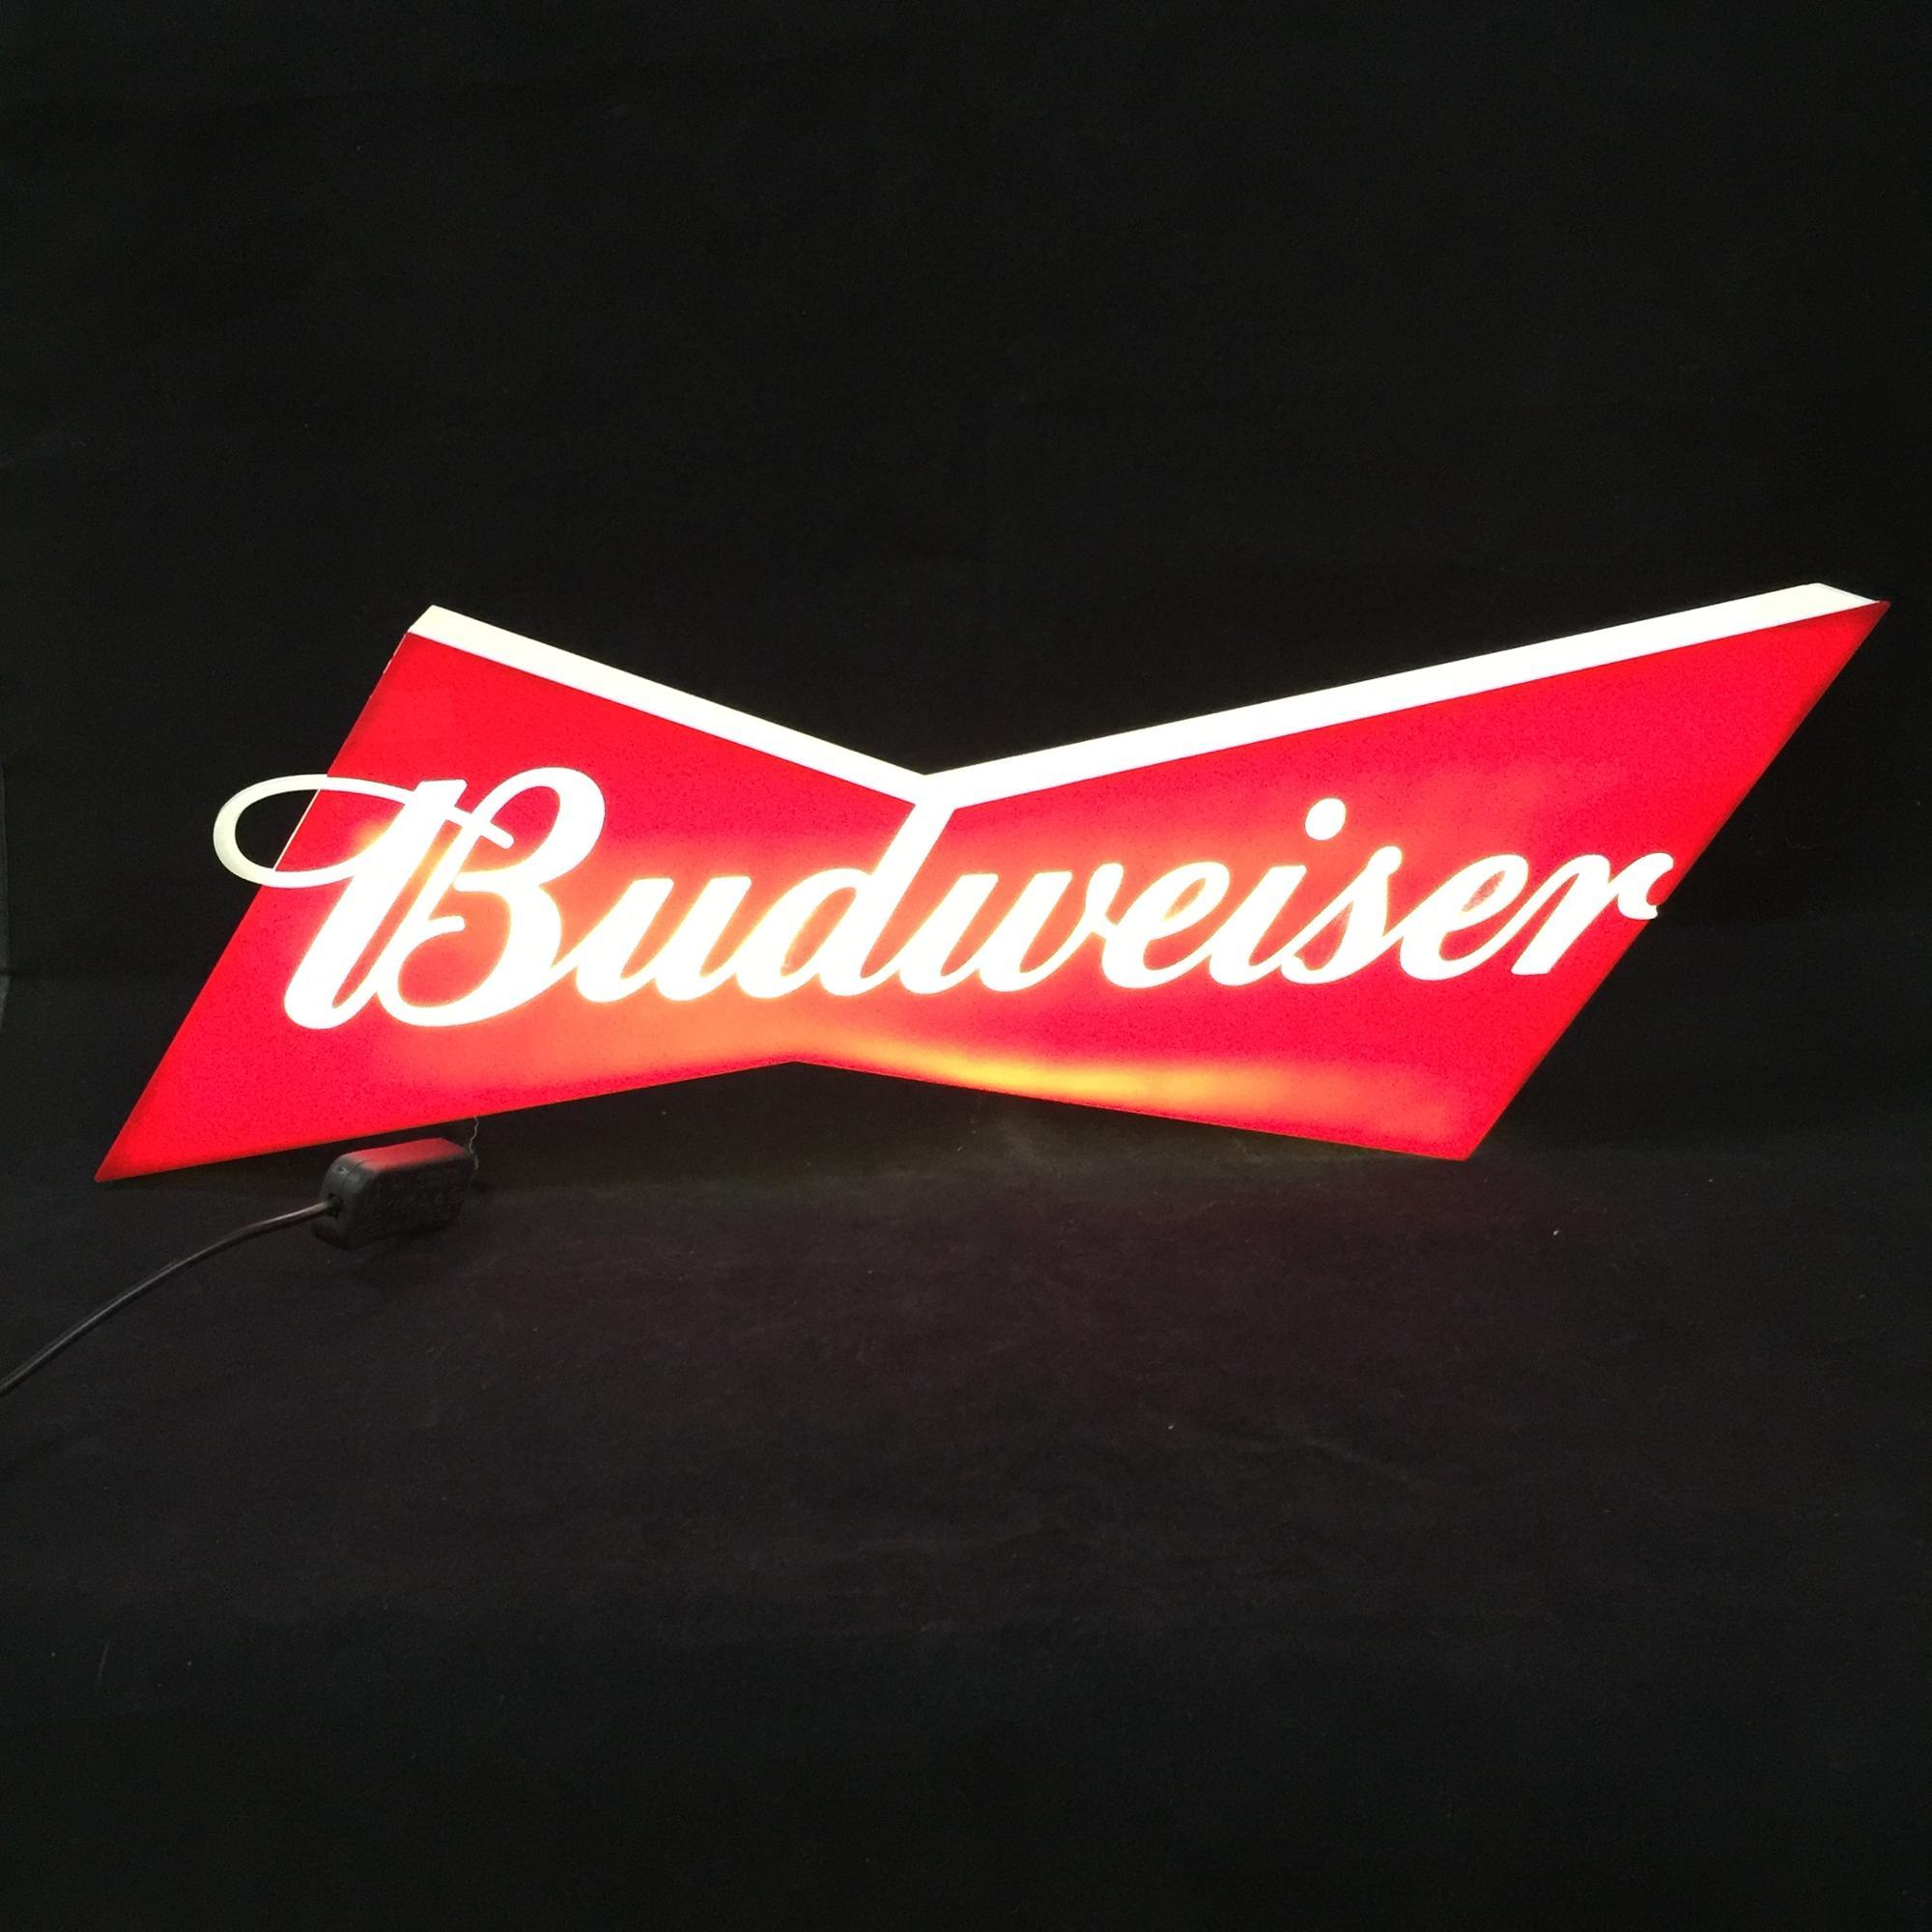 Budweiser Led Bar Wall Signs - Buy Budweiser Neon Beer